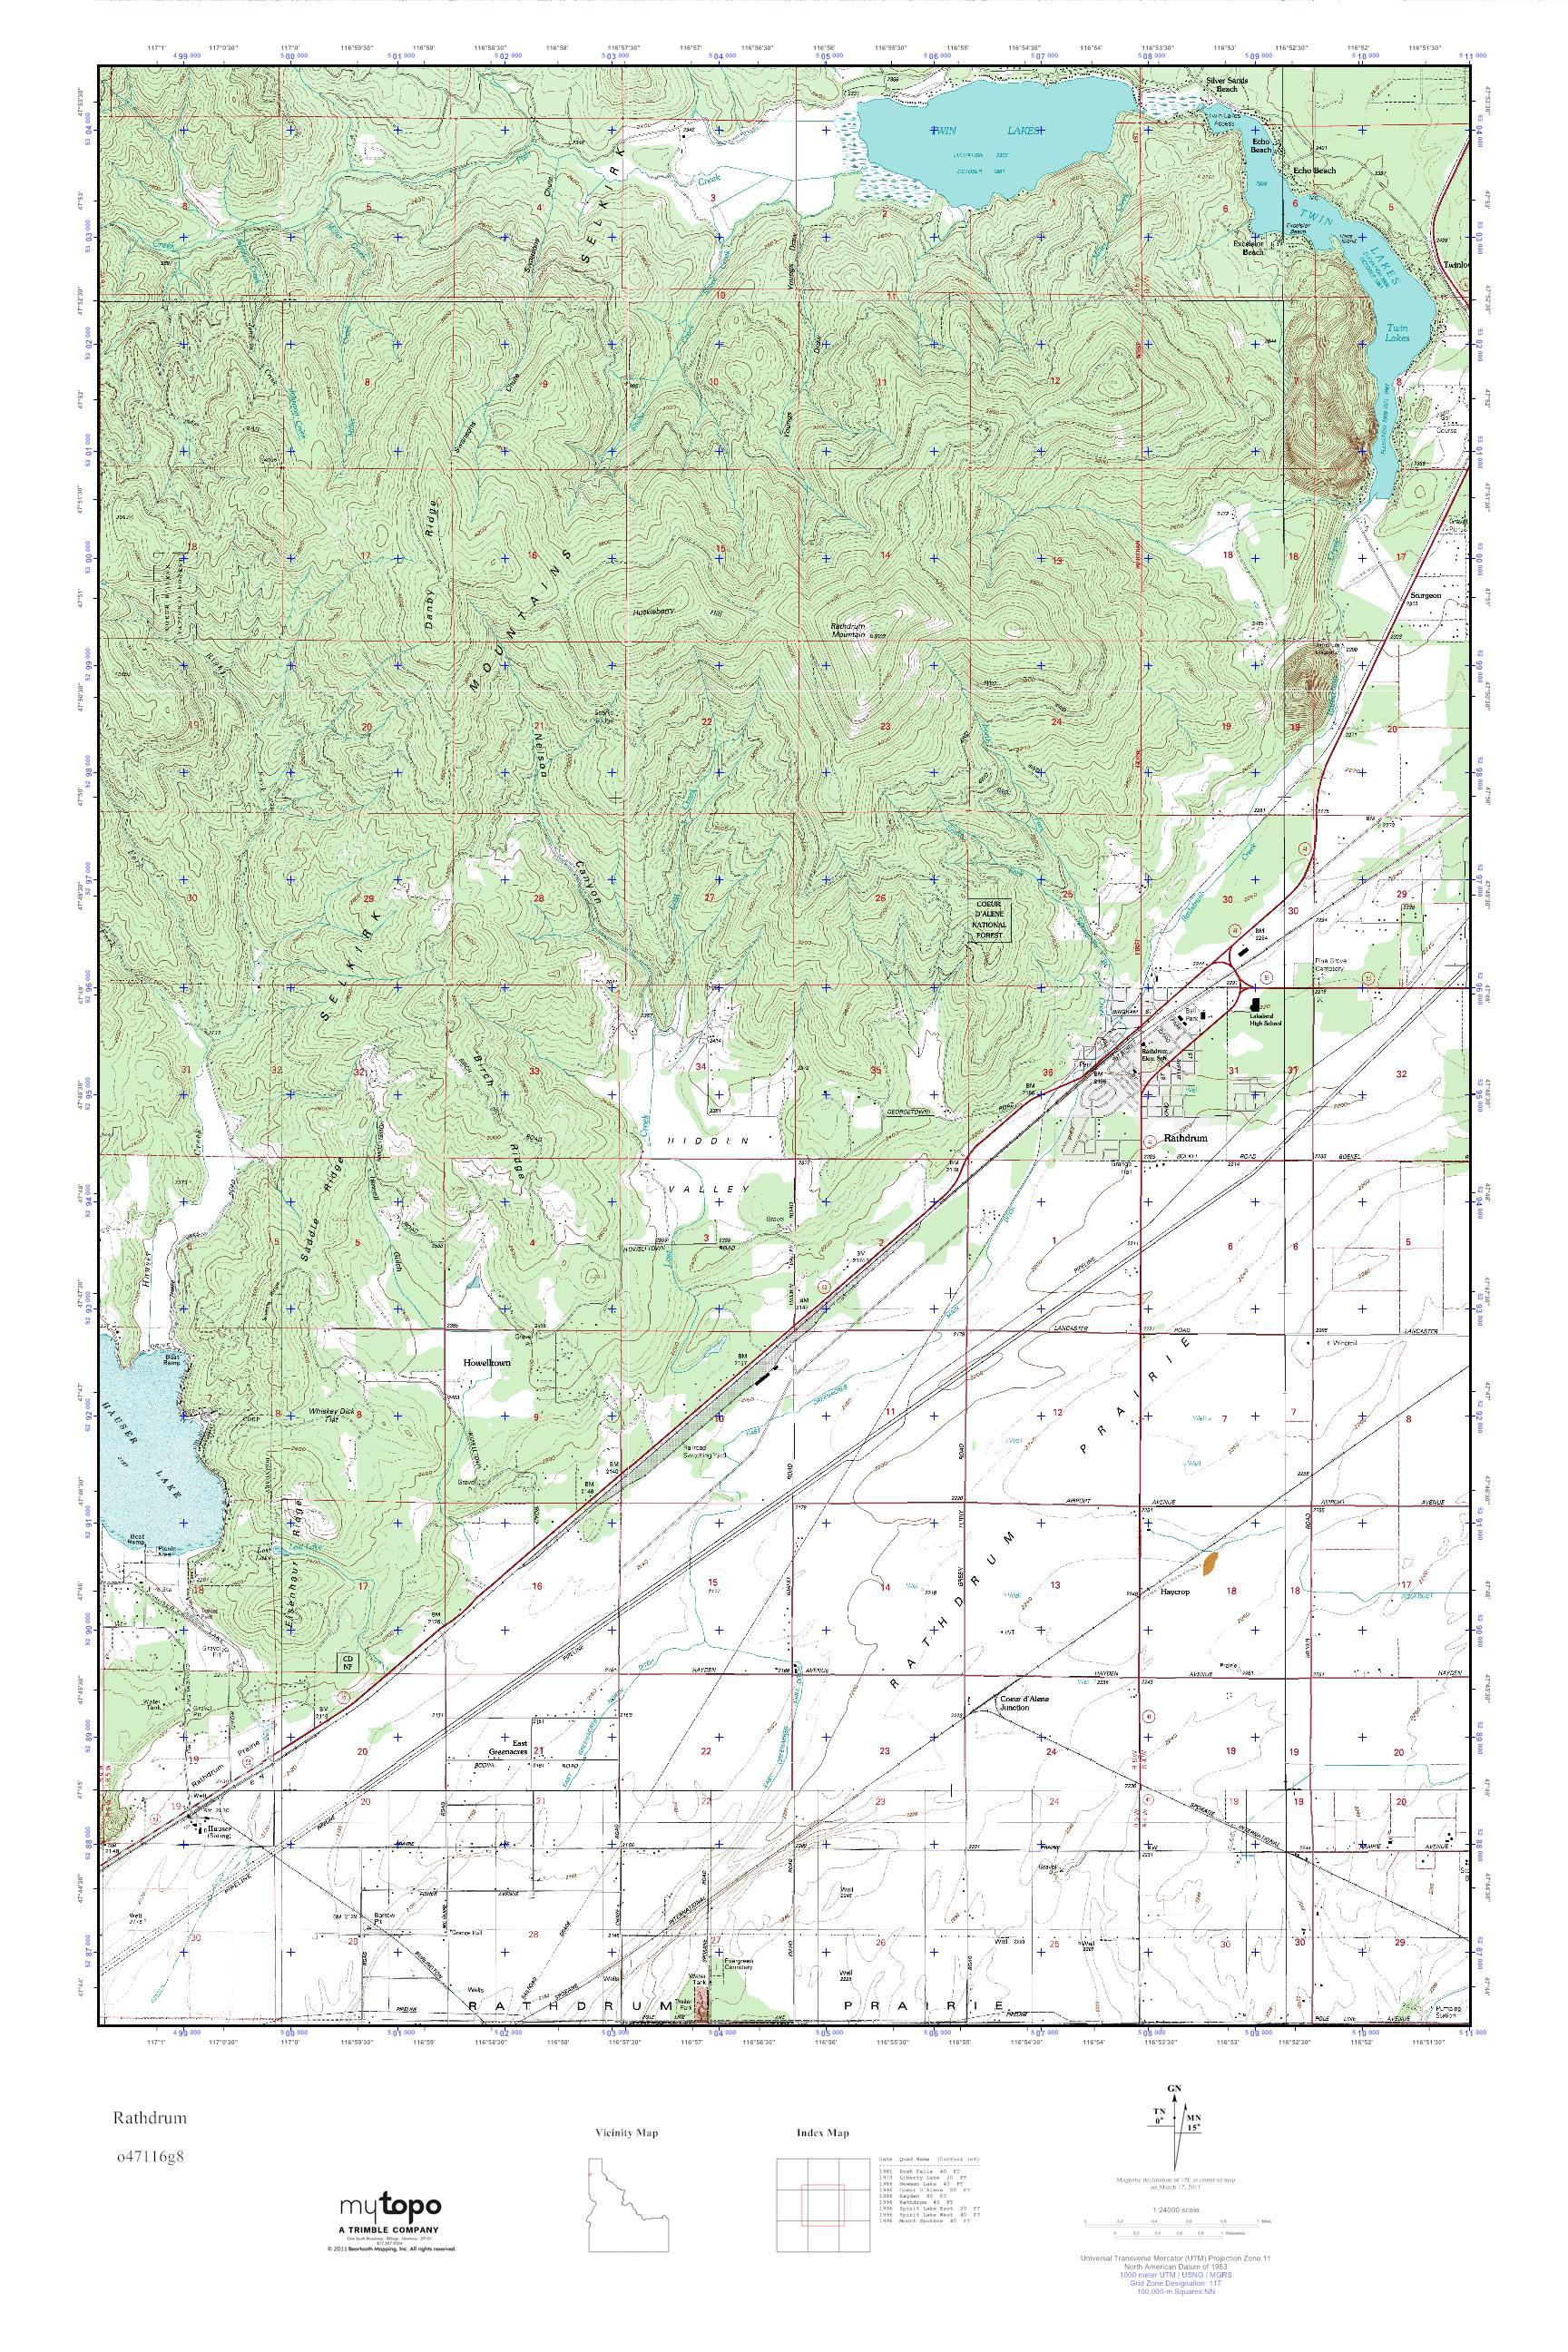 Mytopo Rathdrum Idaho Usgs Quad Topo Map